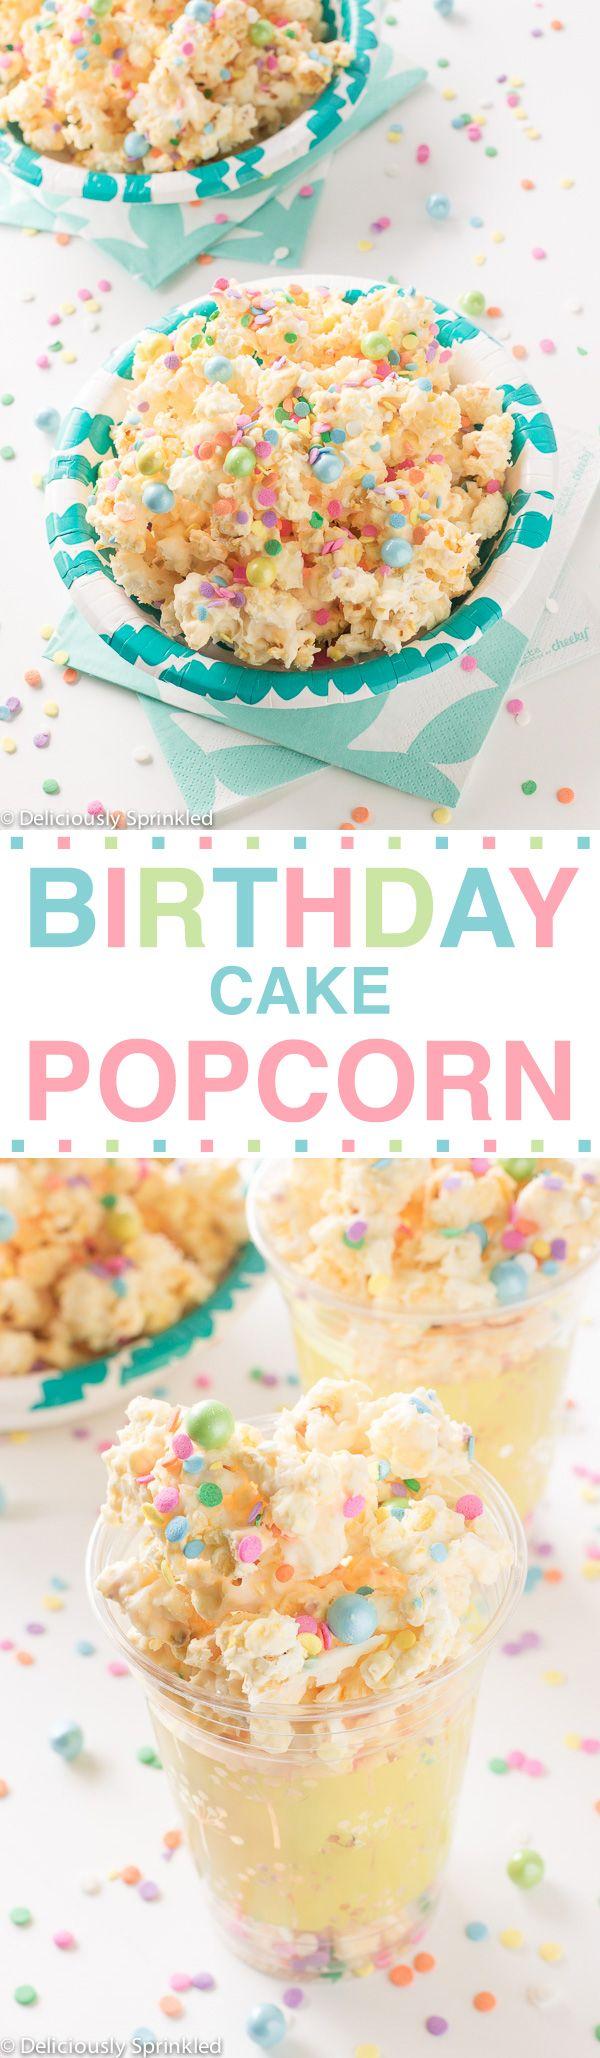 The BEST Birthday Cake Popcorn